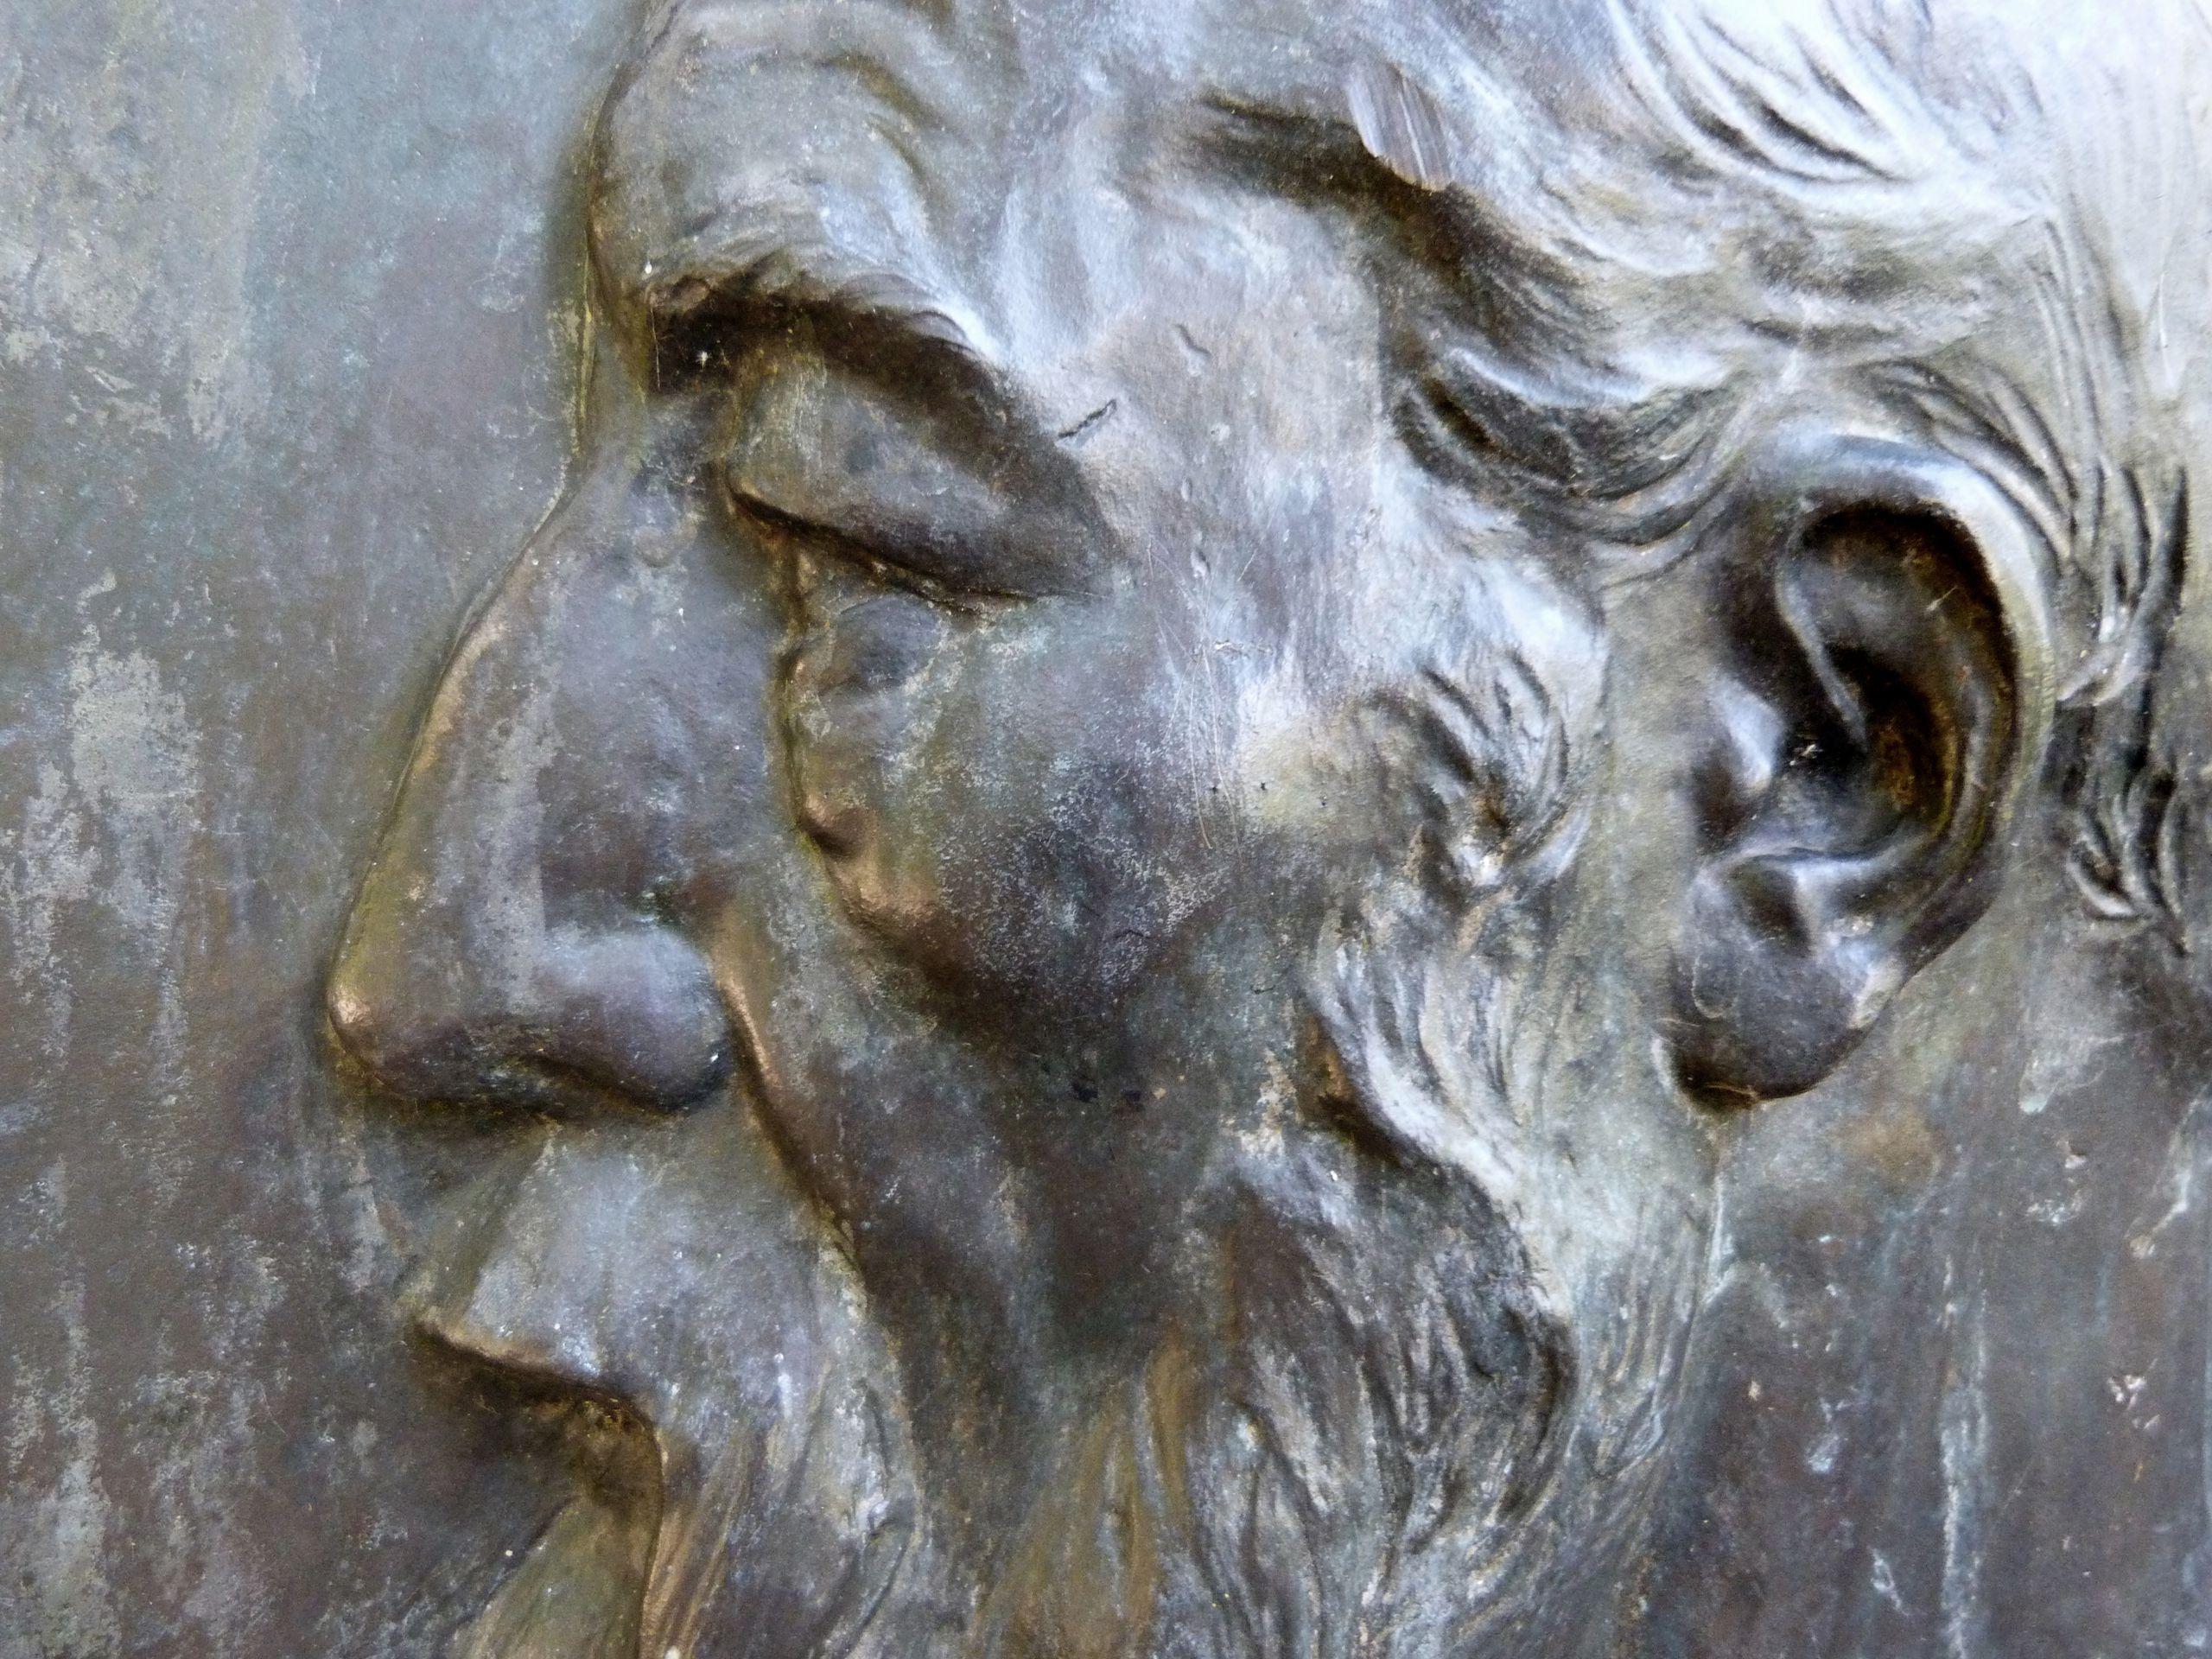 Gedenktafel, Ludwig Andreas Feuerbach Portraitdetail